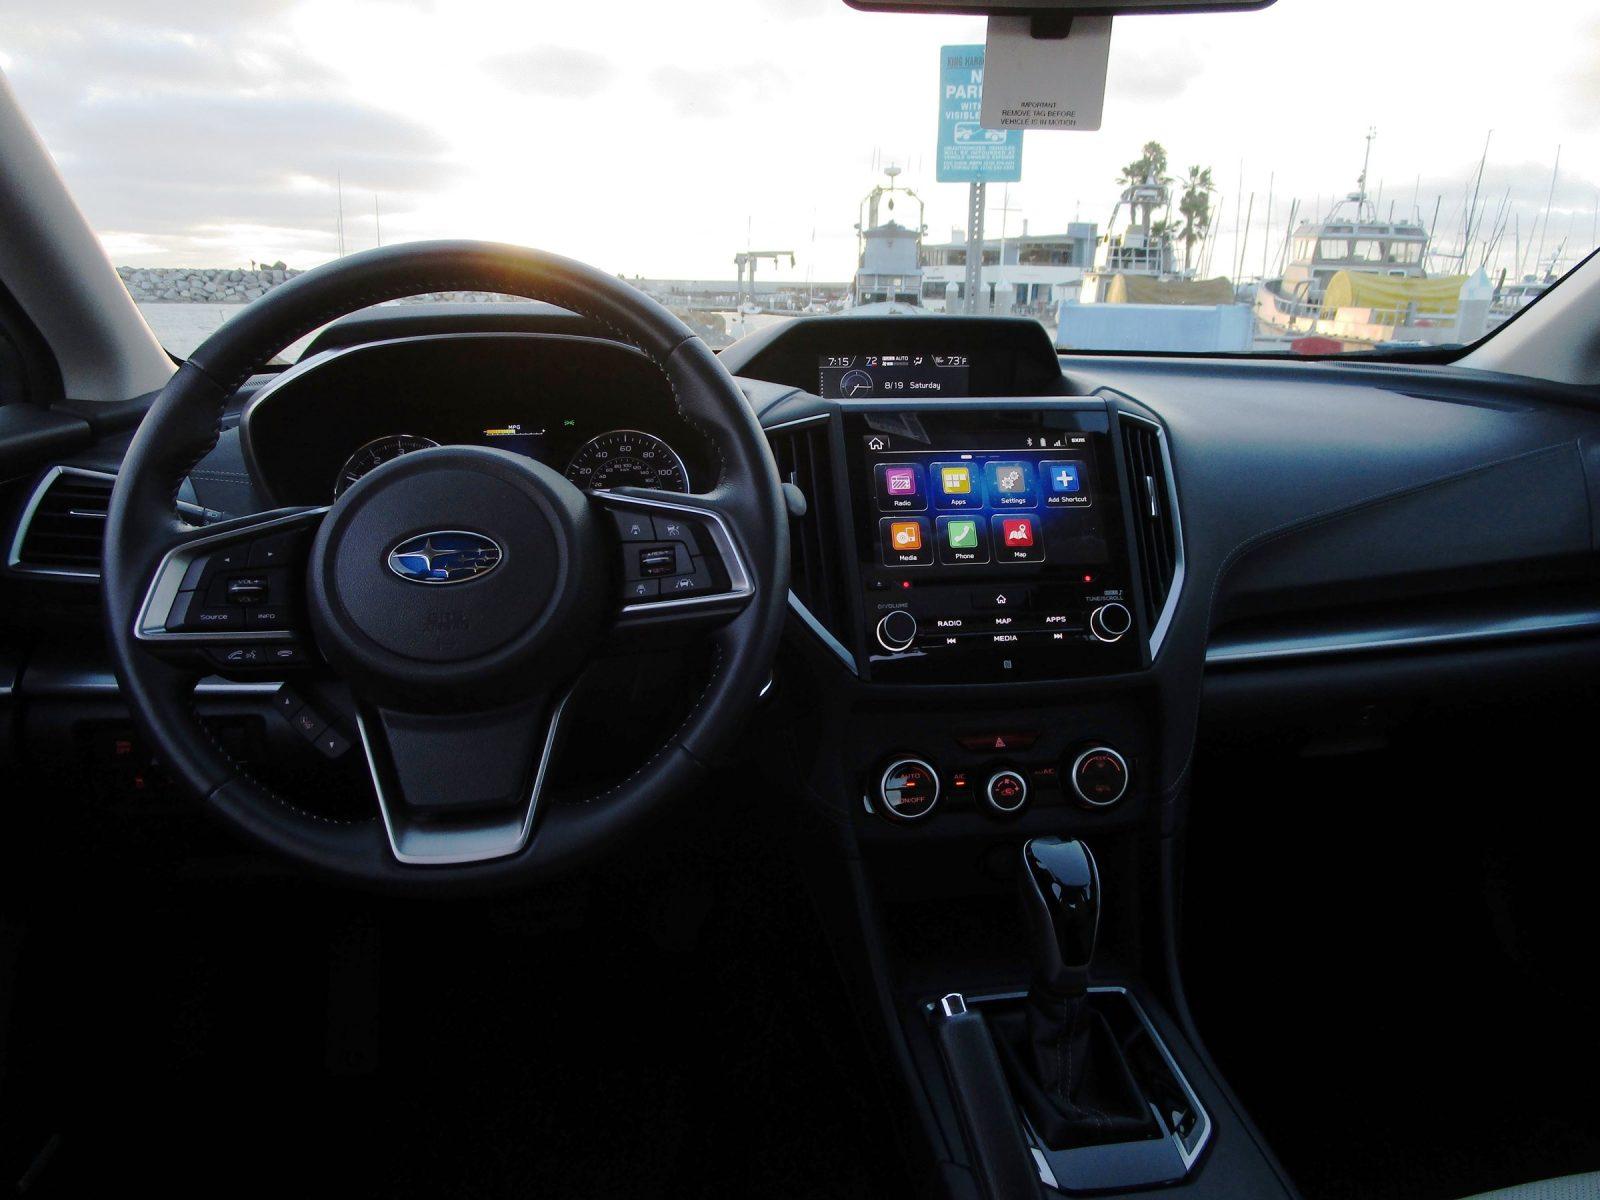 2018 Subaru Hatchback Sti New Car Release Date And Review 2018 Amanda Felicia